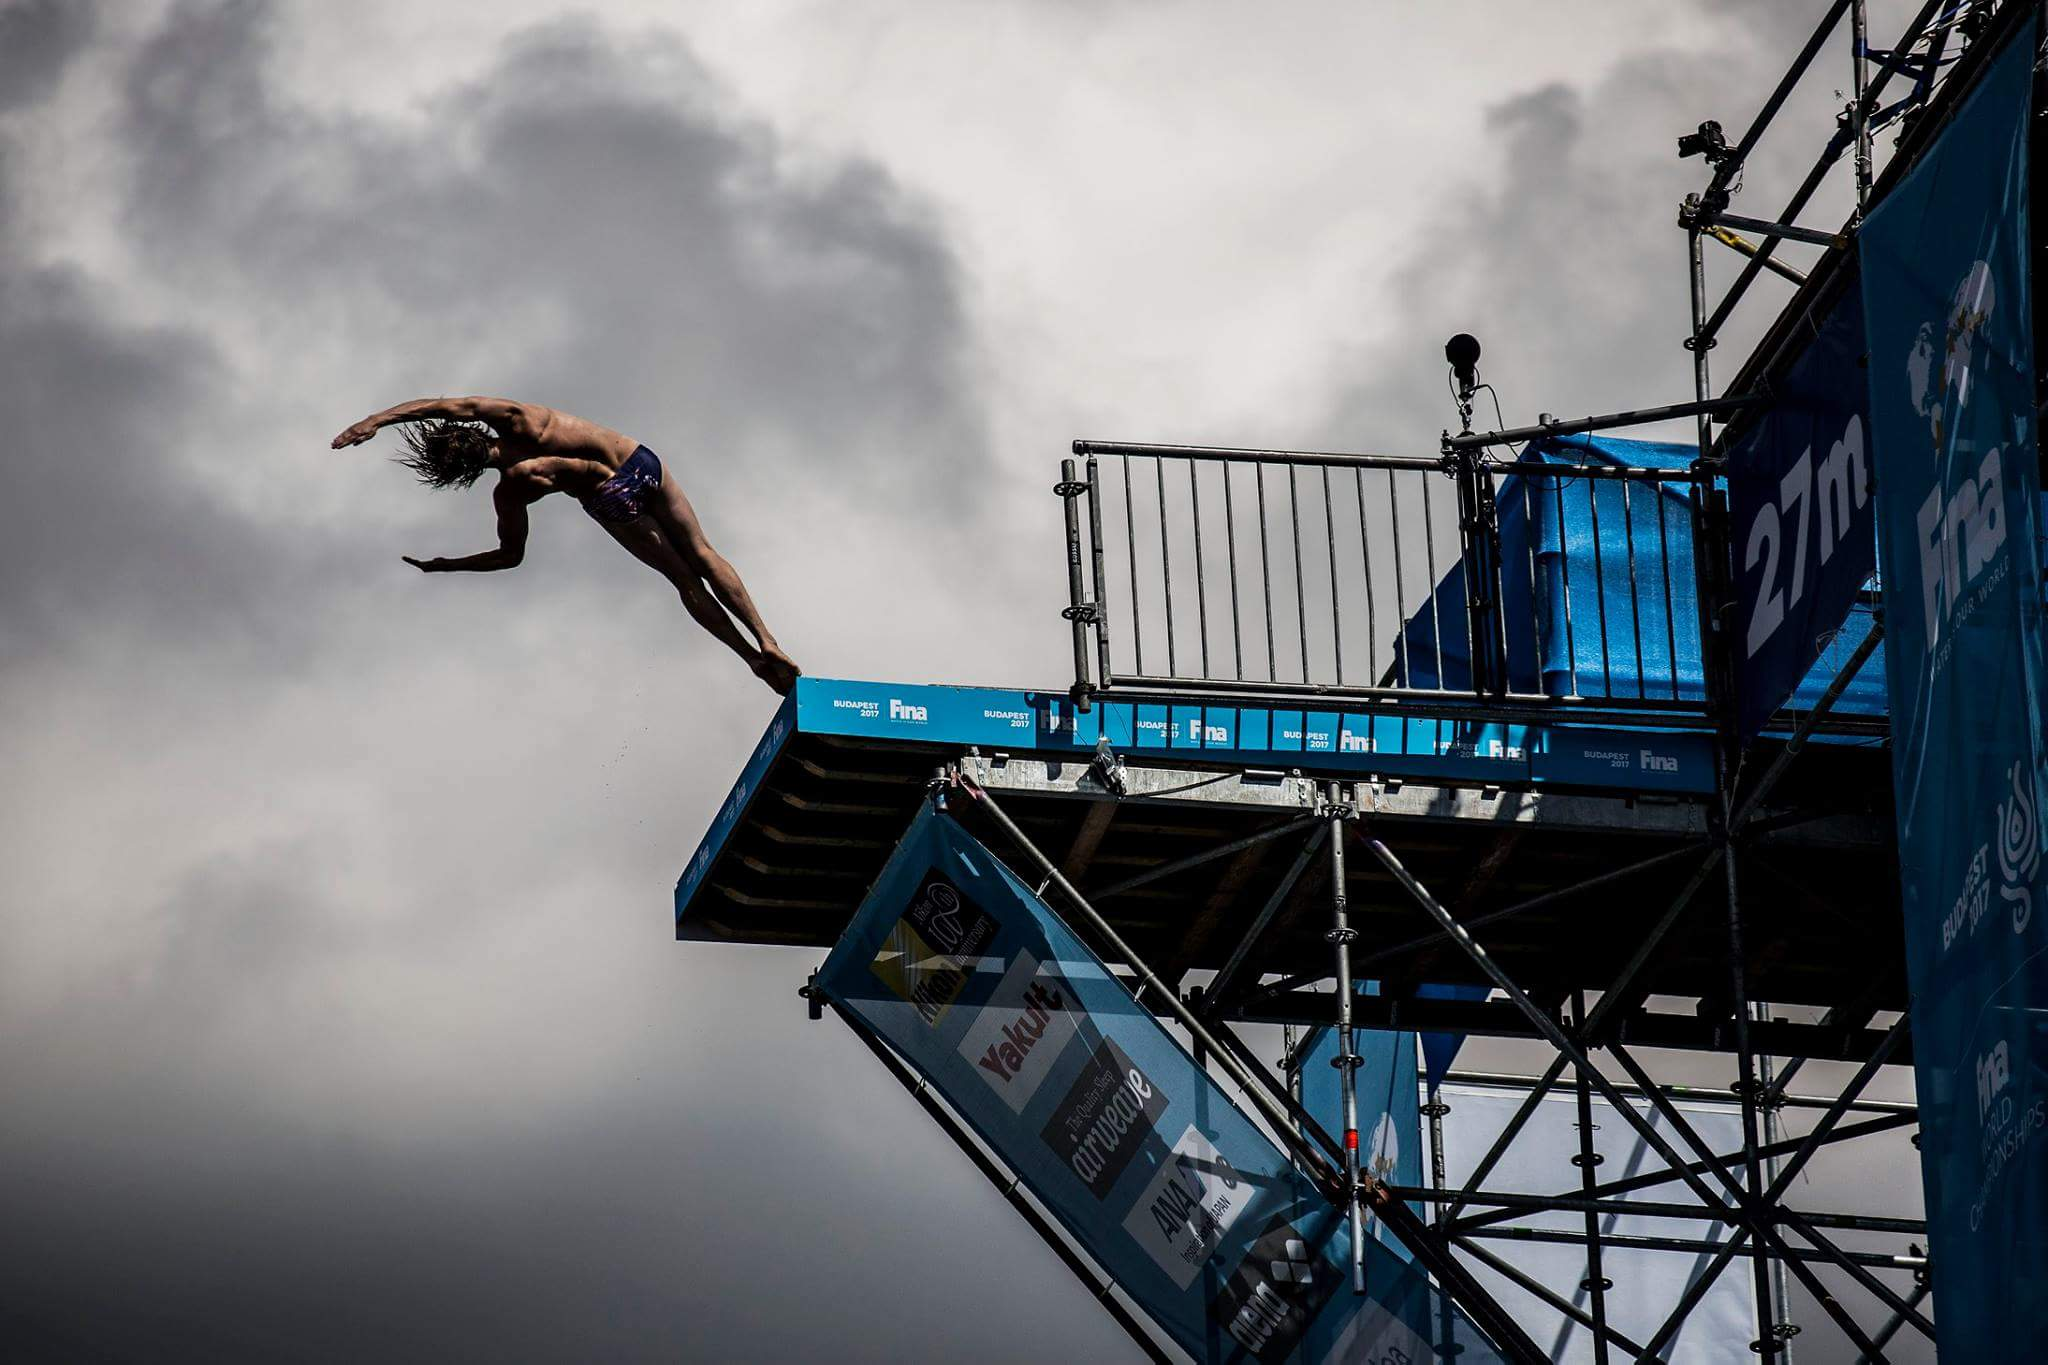 Campionati Mondiali: Budapest – Grandi altezze, Rhiannan Iffland regina!